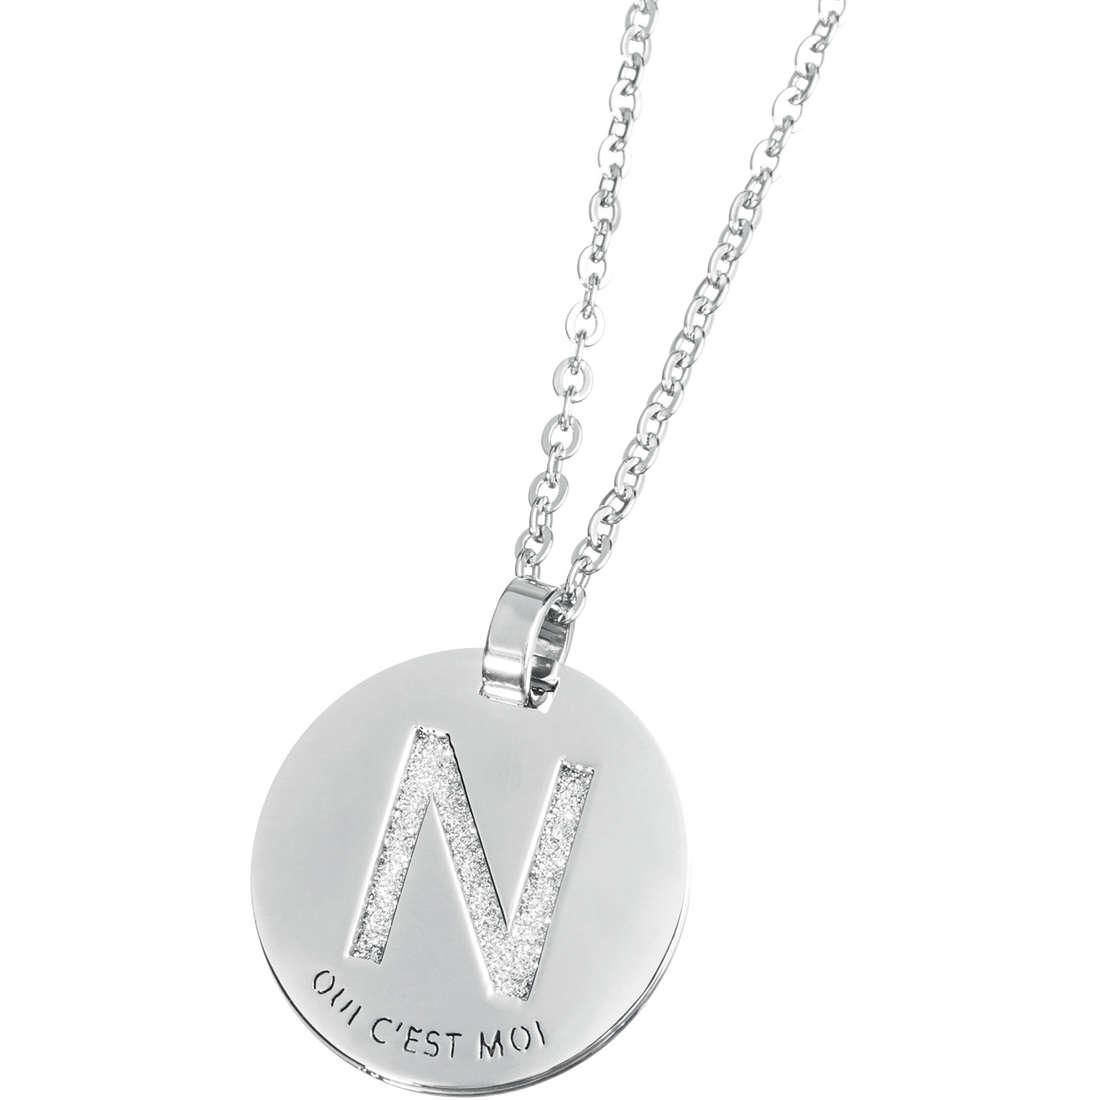 necklace unisex jewellery Marlù Oui C'Est Moi 18CN005N